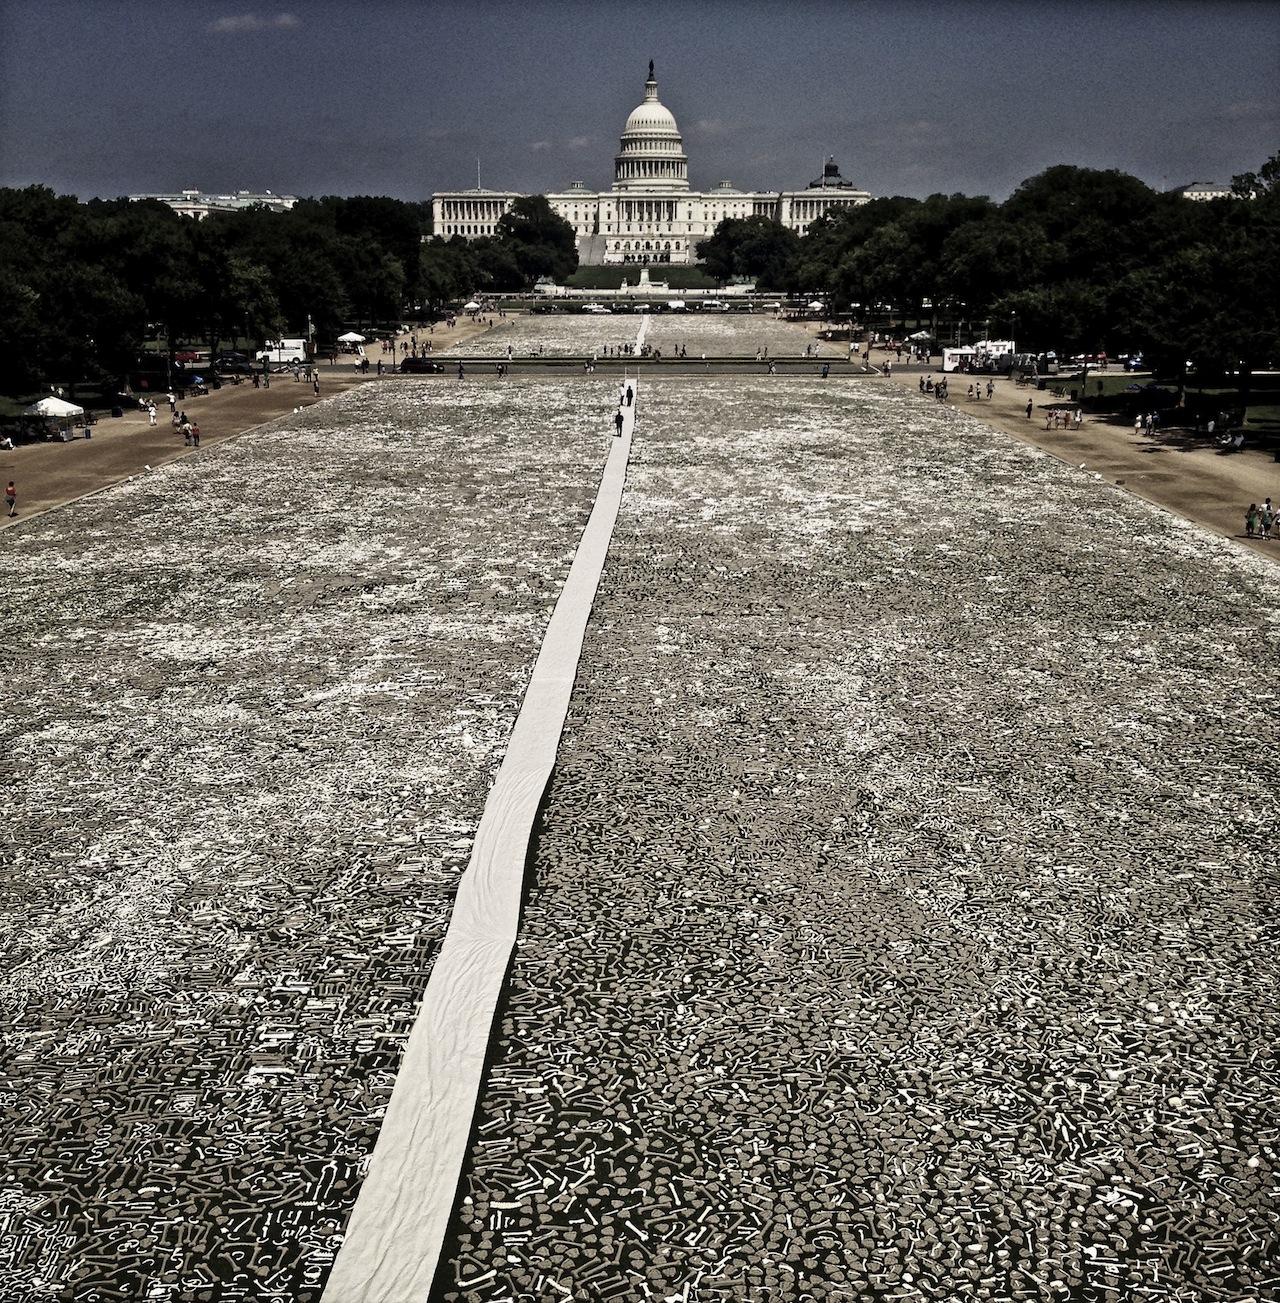 The installation of one million bones on the National Mall (Photography by Teru Kuwayama)